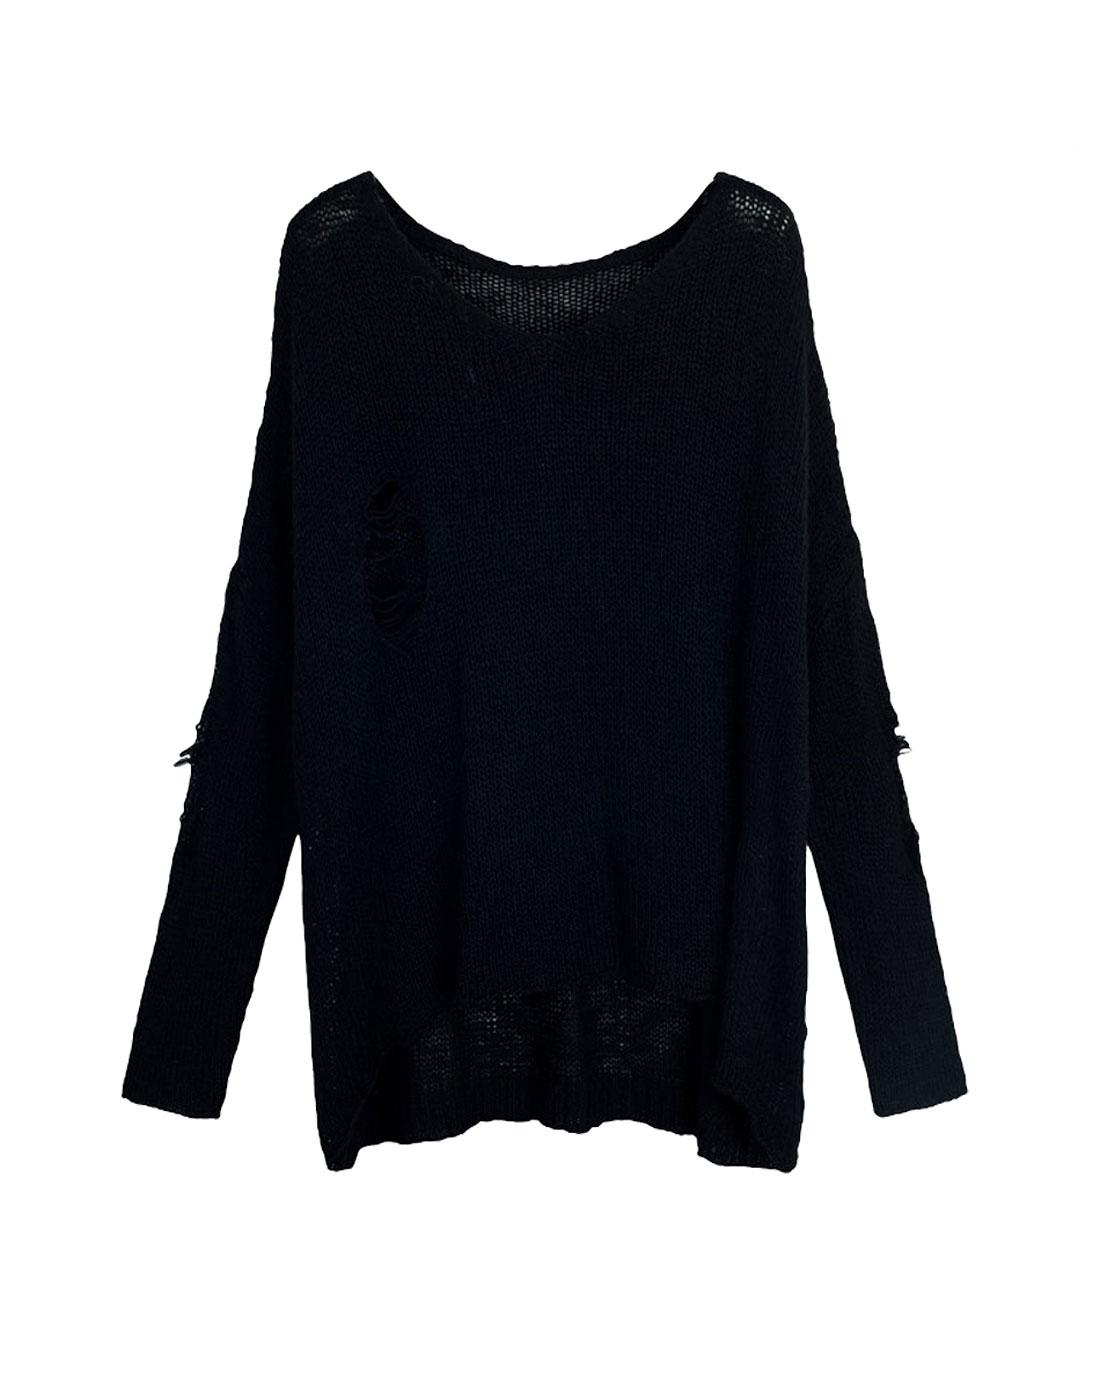 other mix 女款黑色破洞镂空针织长袖毛衣